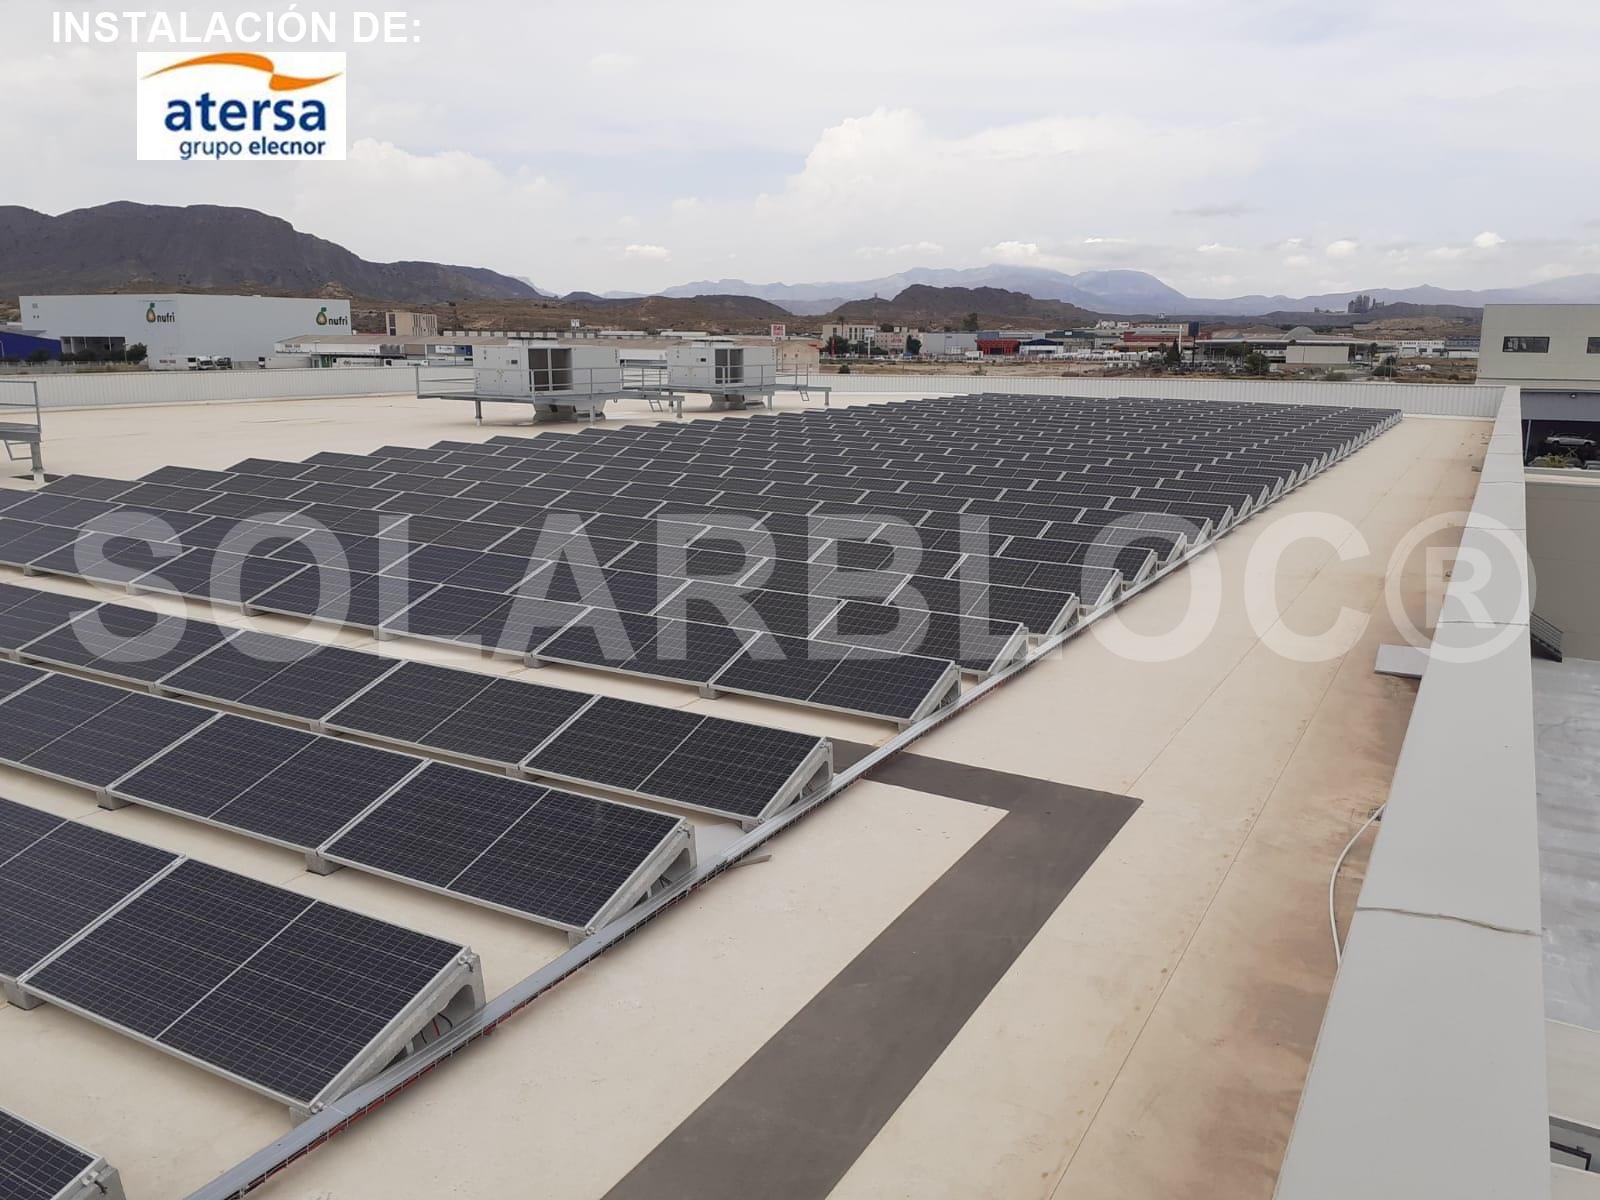 Soporte regulable para paneles solares SOLARBLOC ATERSA